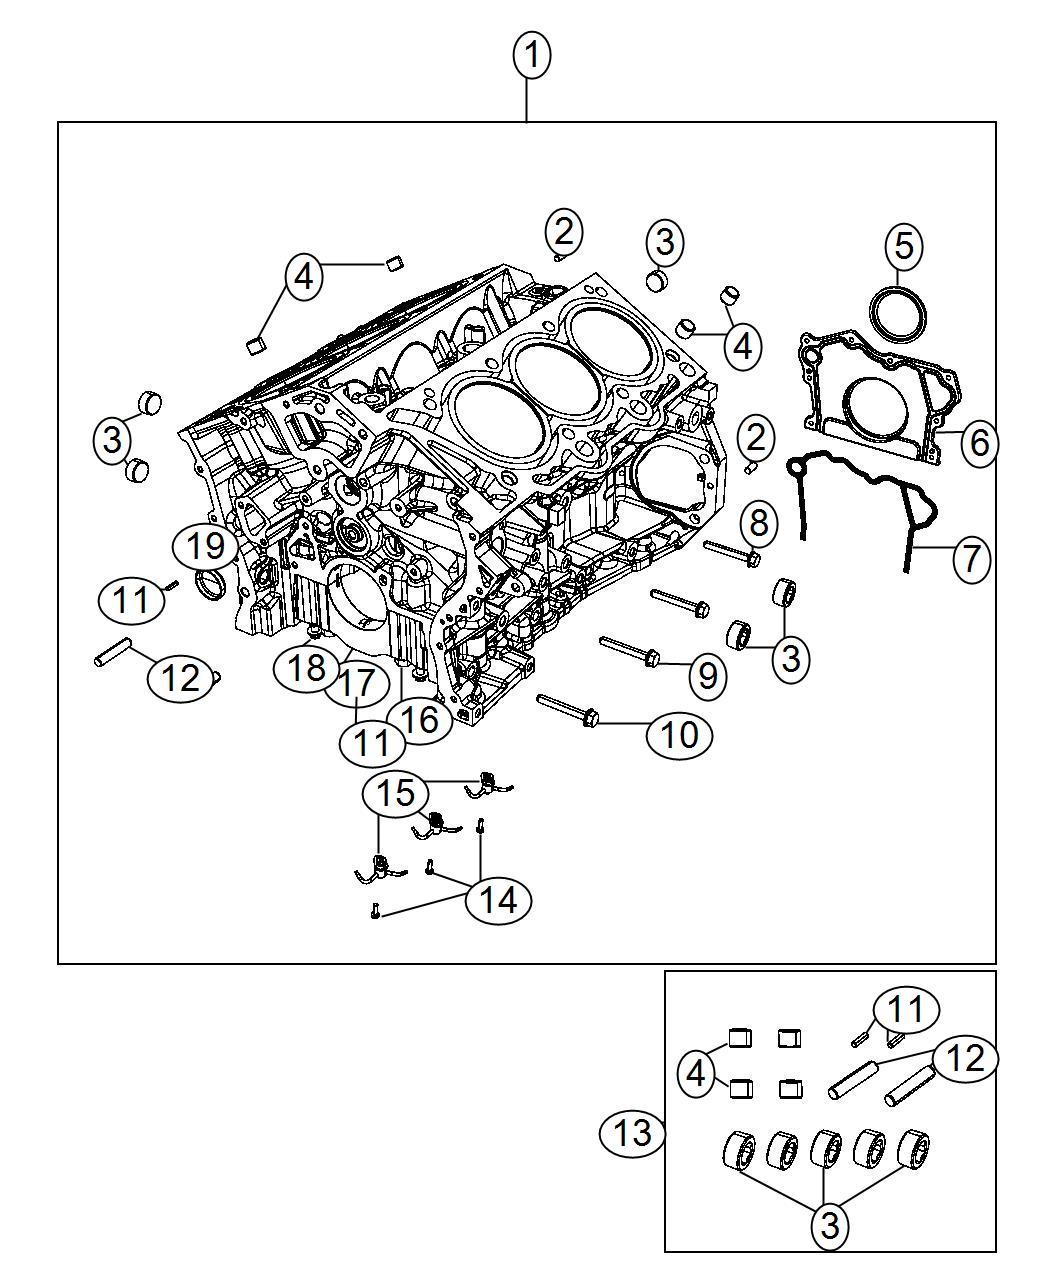 2014 Jeep Wrangler Engine Kit  Short Block